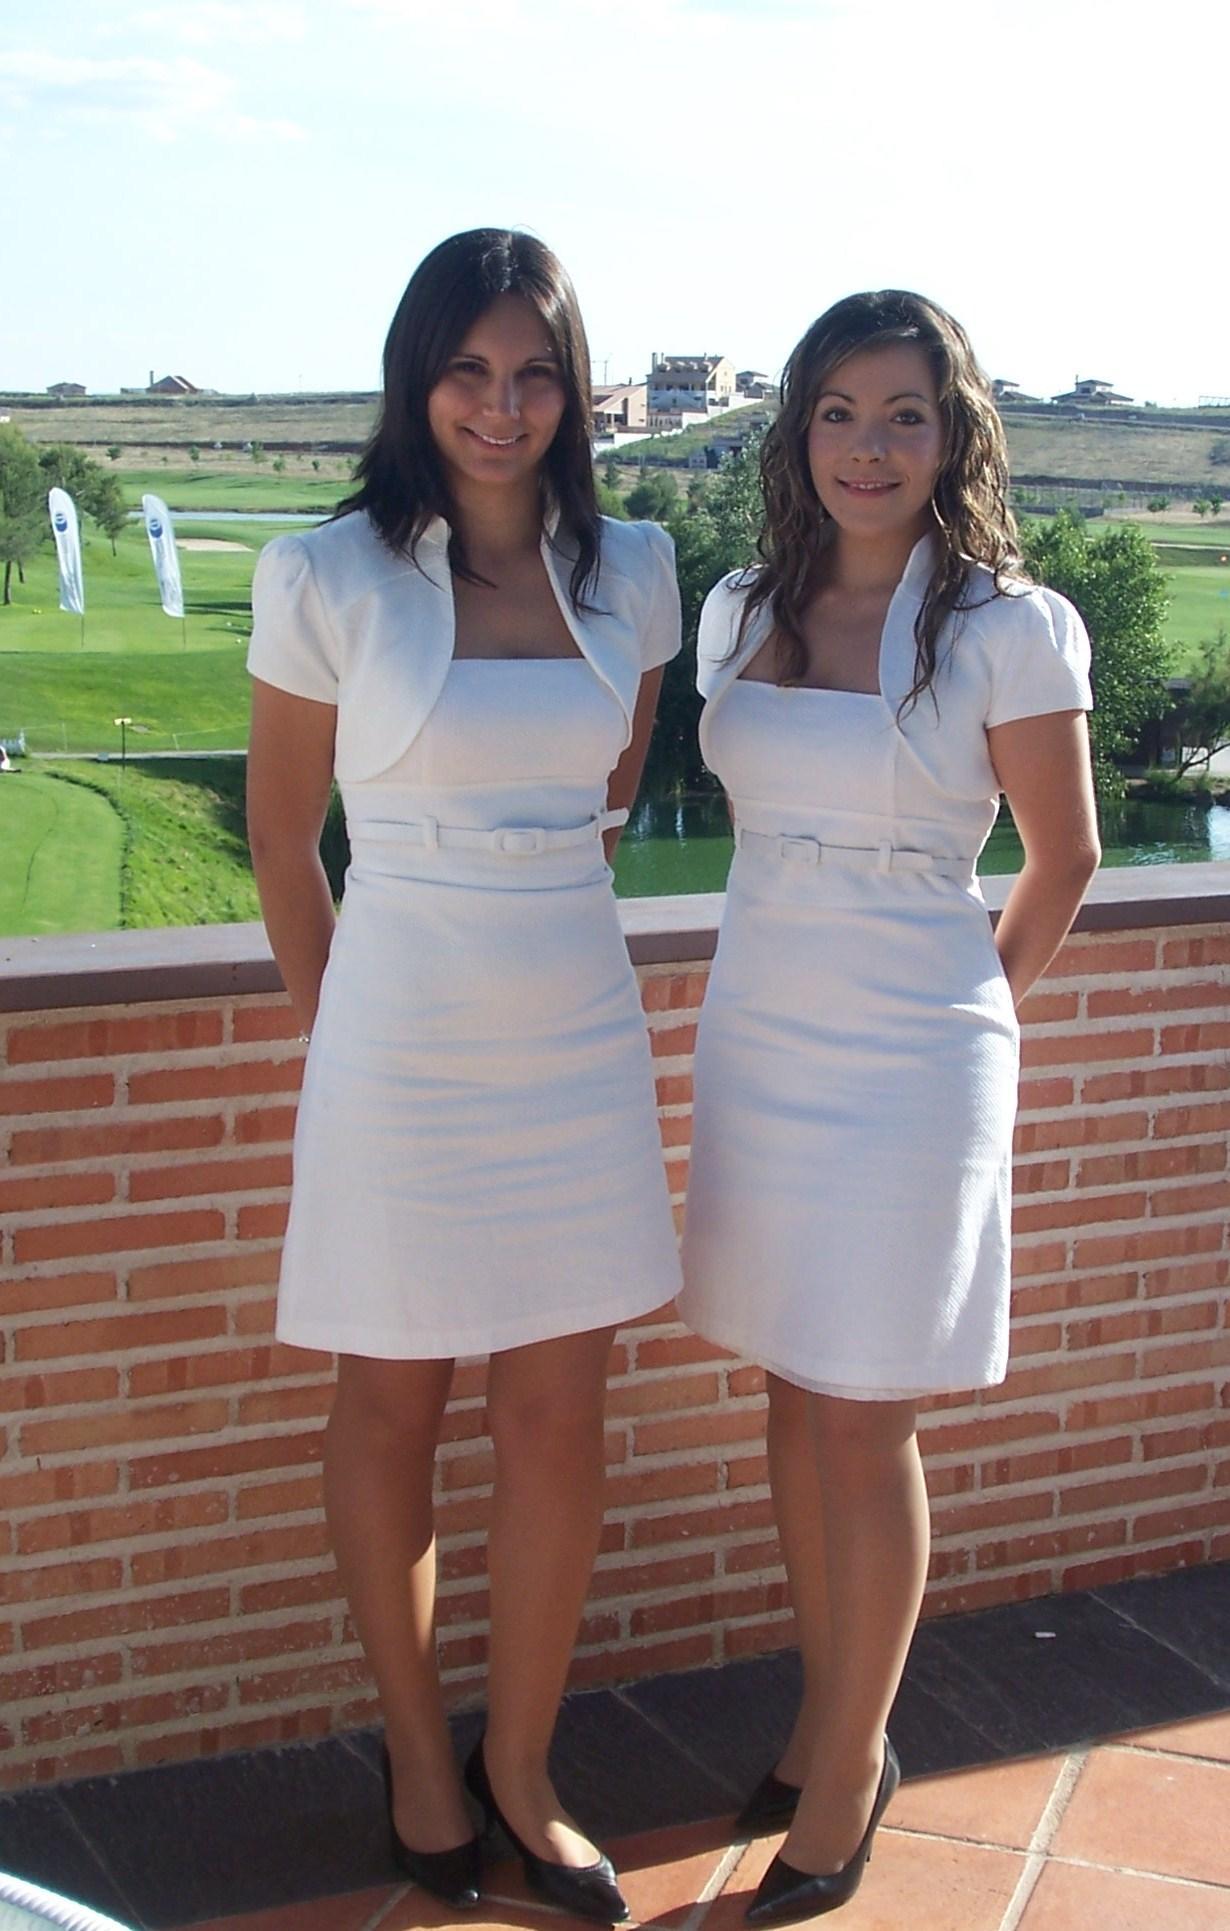 Torneo de golf en La Moraleja